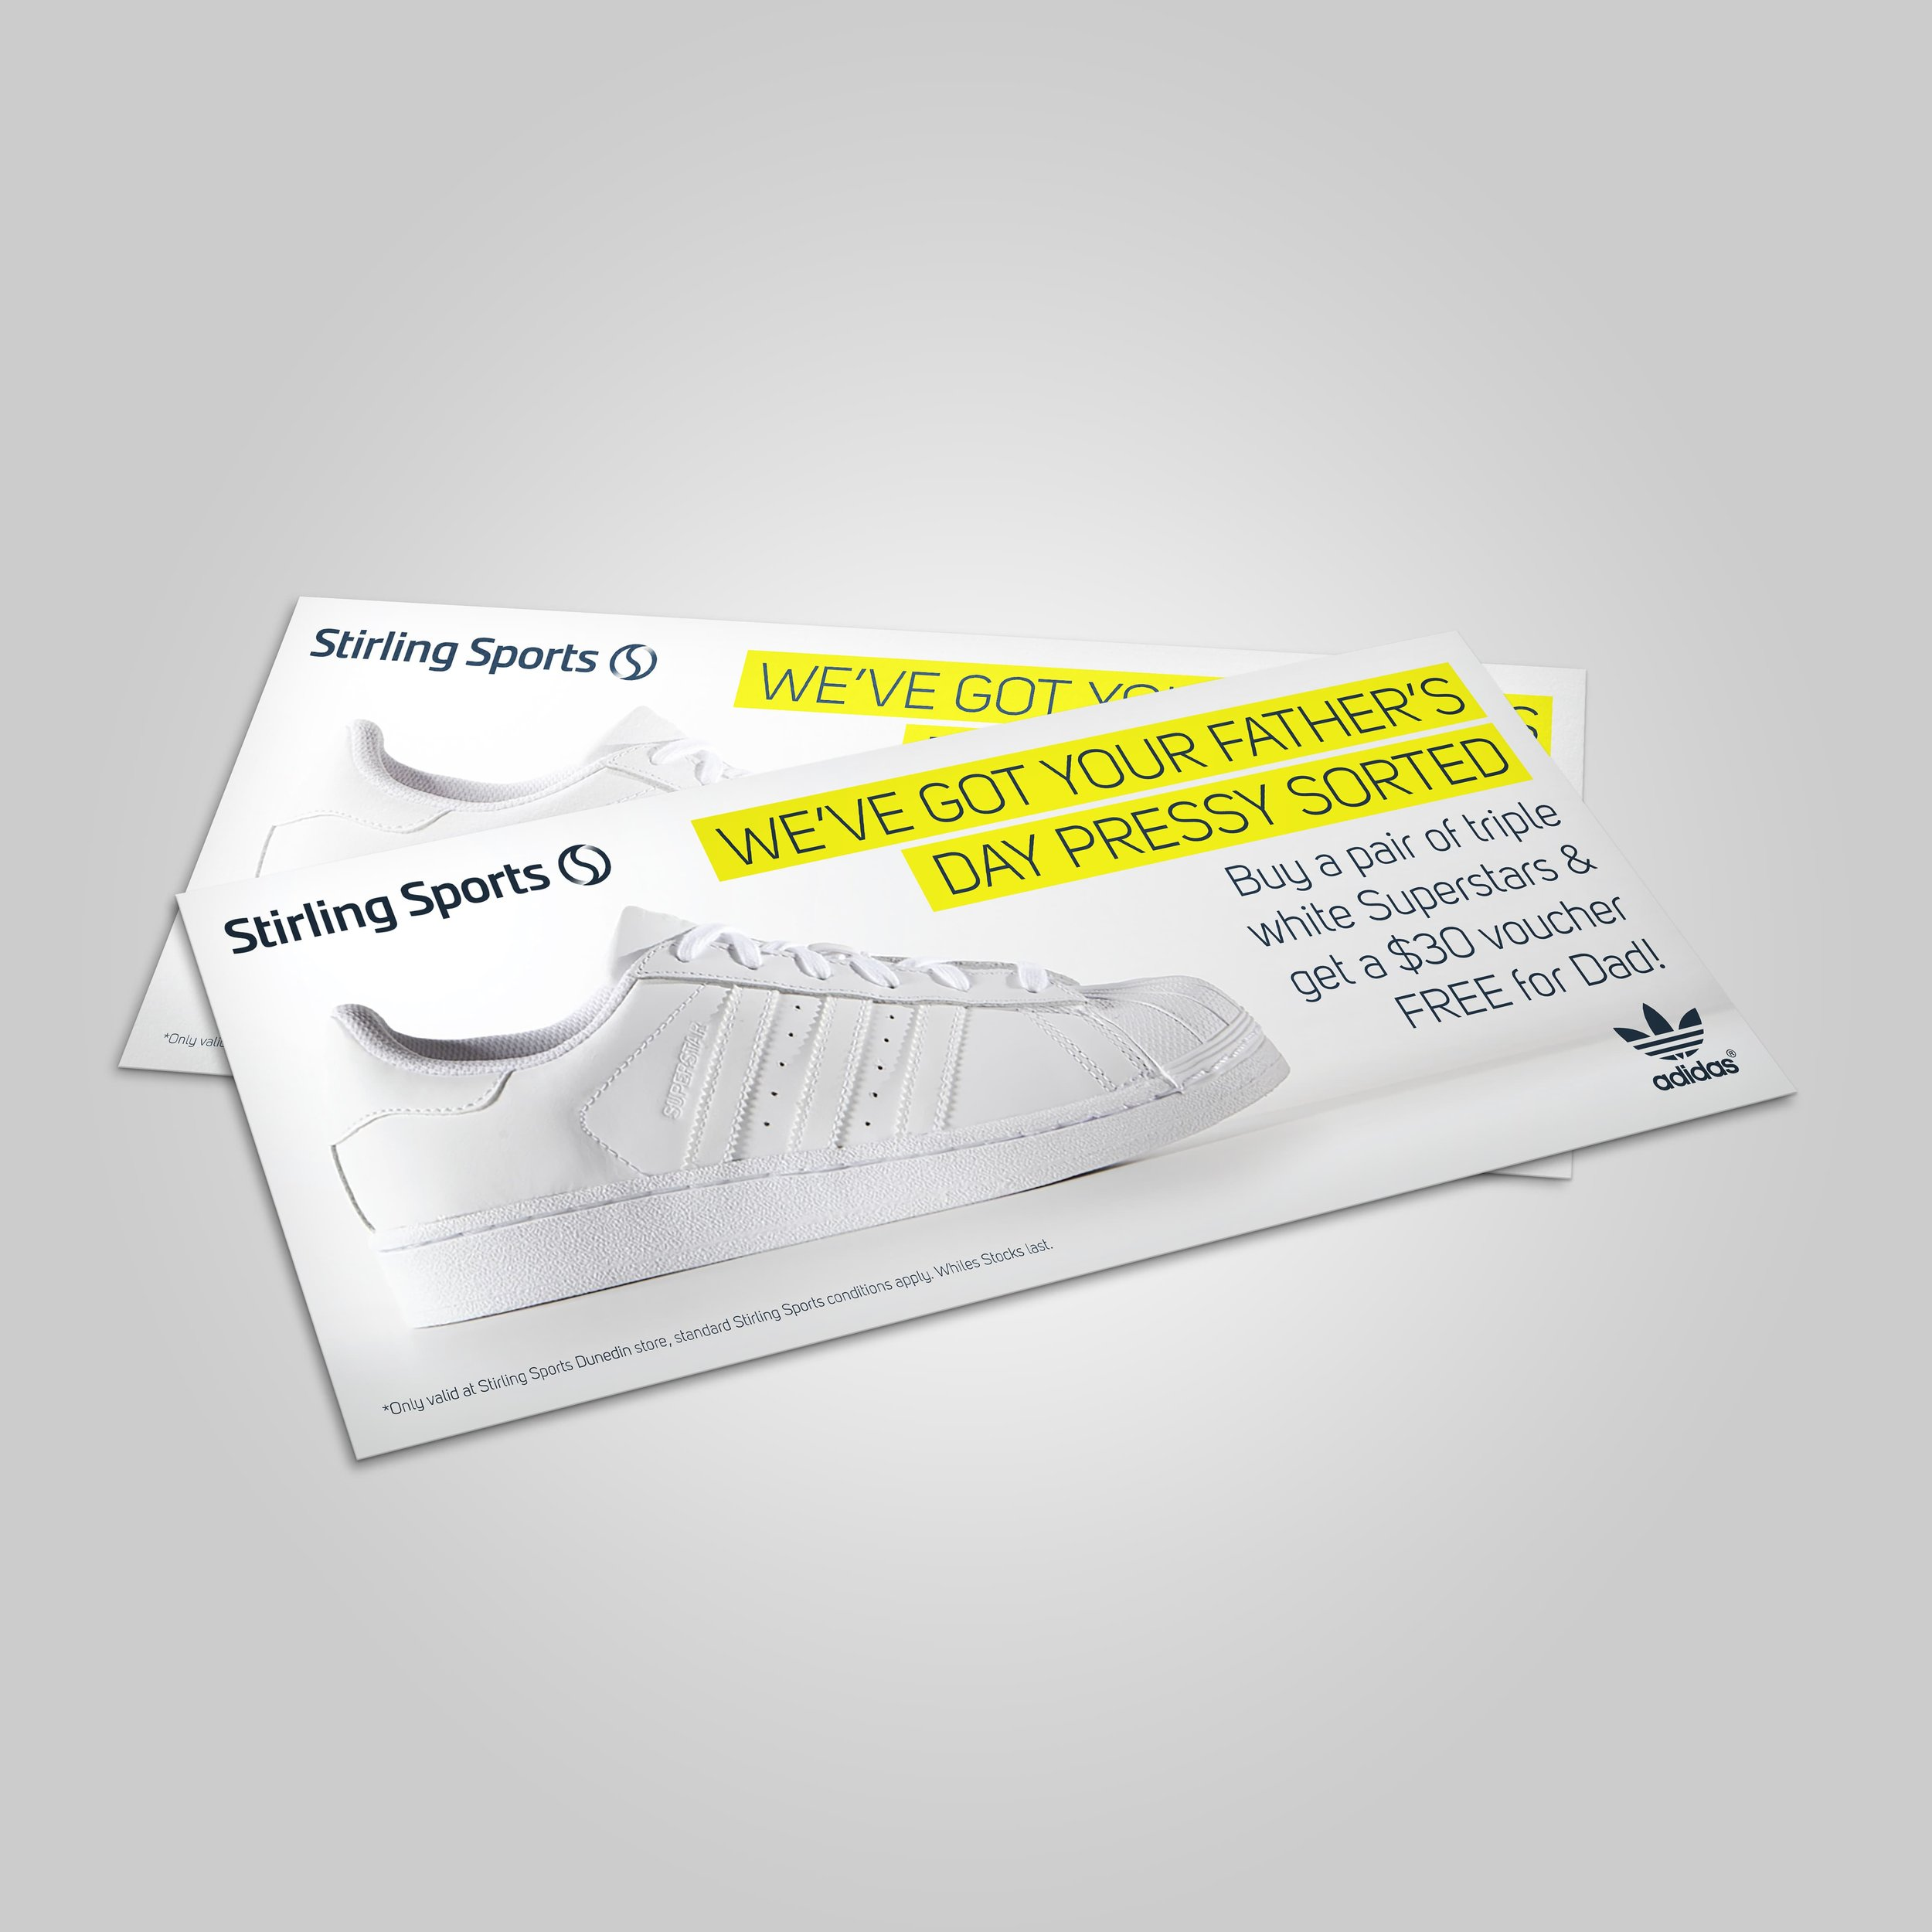 Stirling Sports Flyer1 (square)-min.jpg